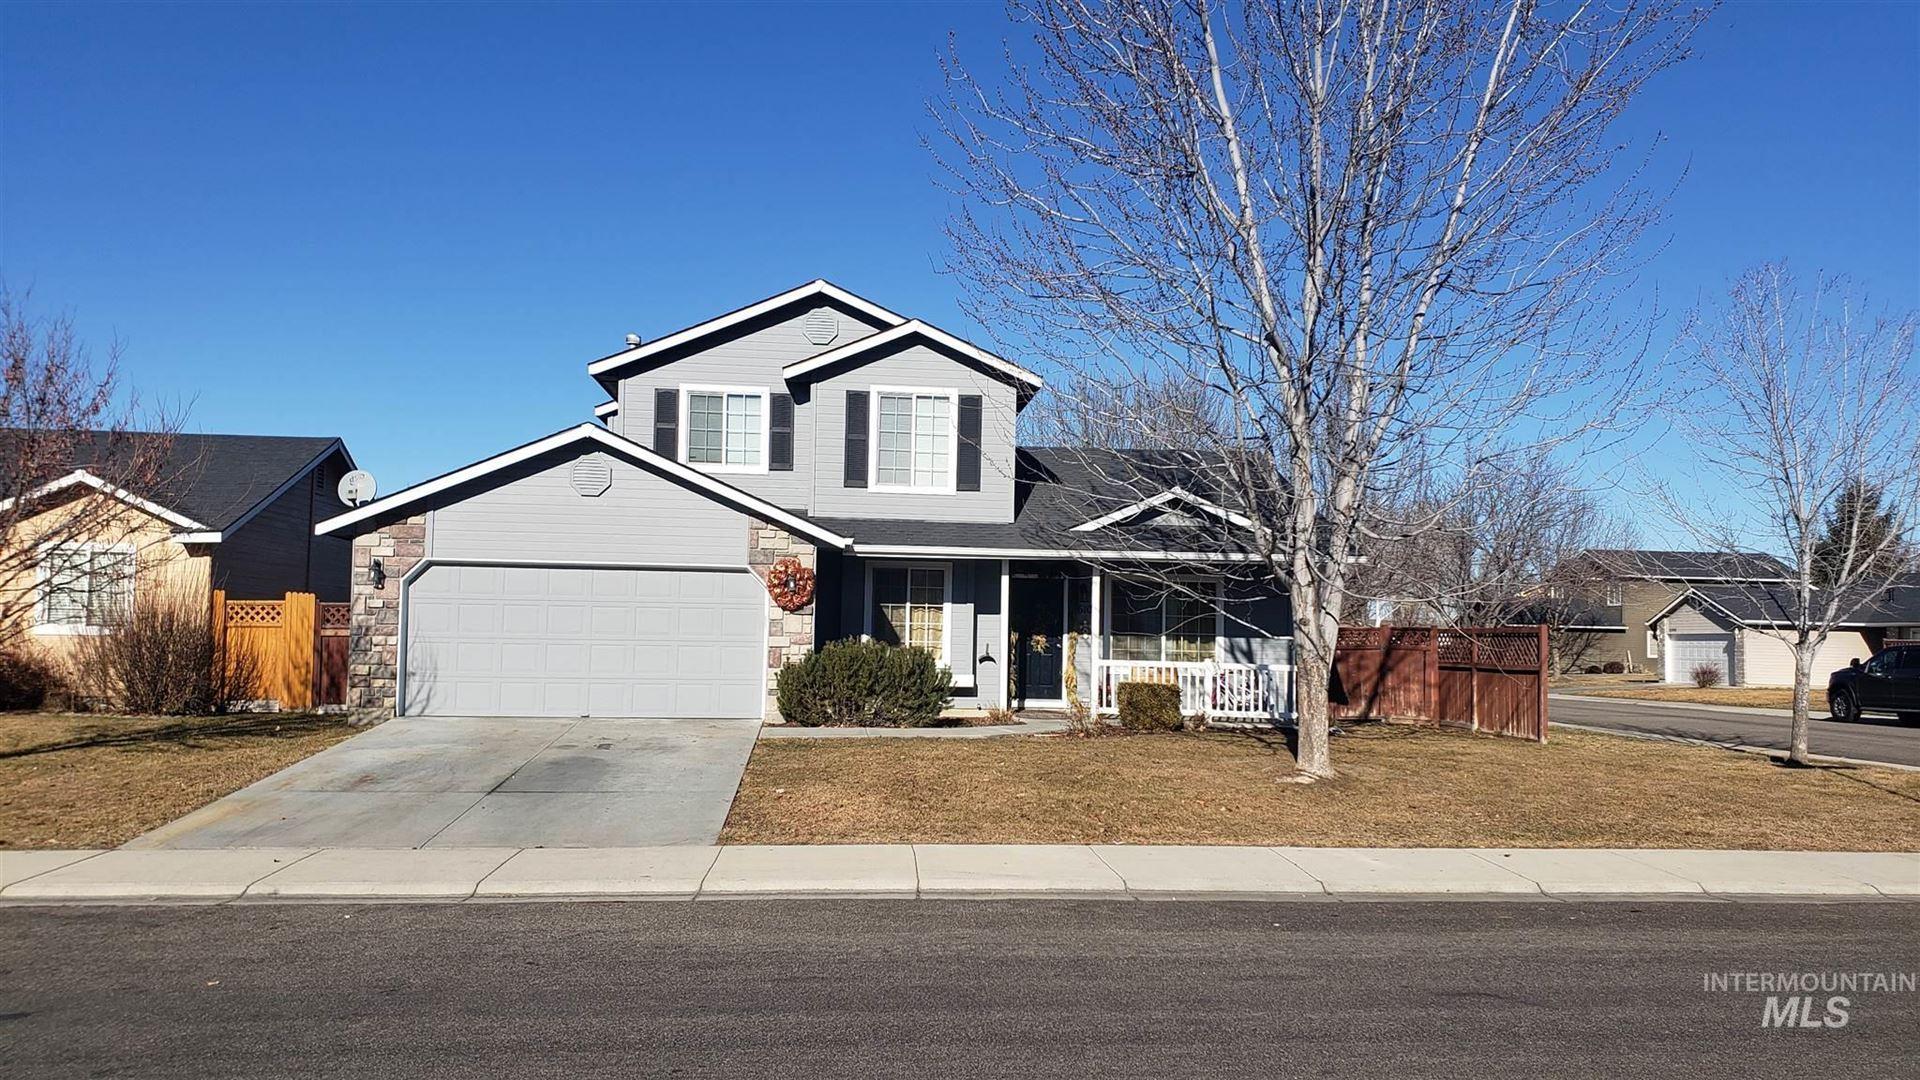 Photo of 610 E Blue Heron Street, Meridian, ID 83646 (MLS # 98791668)